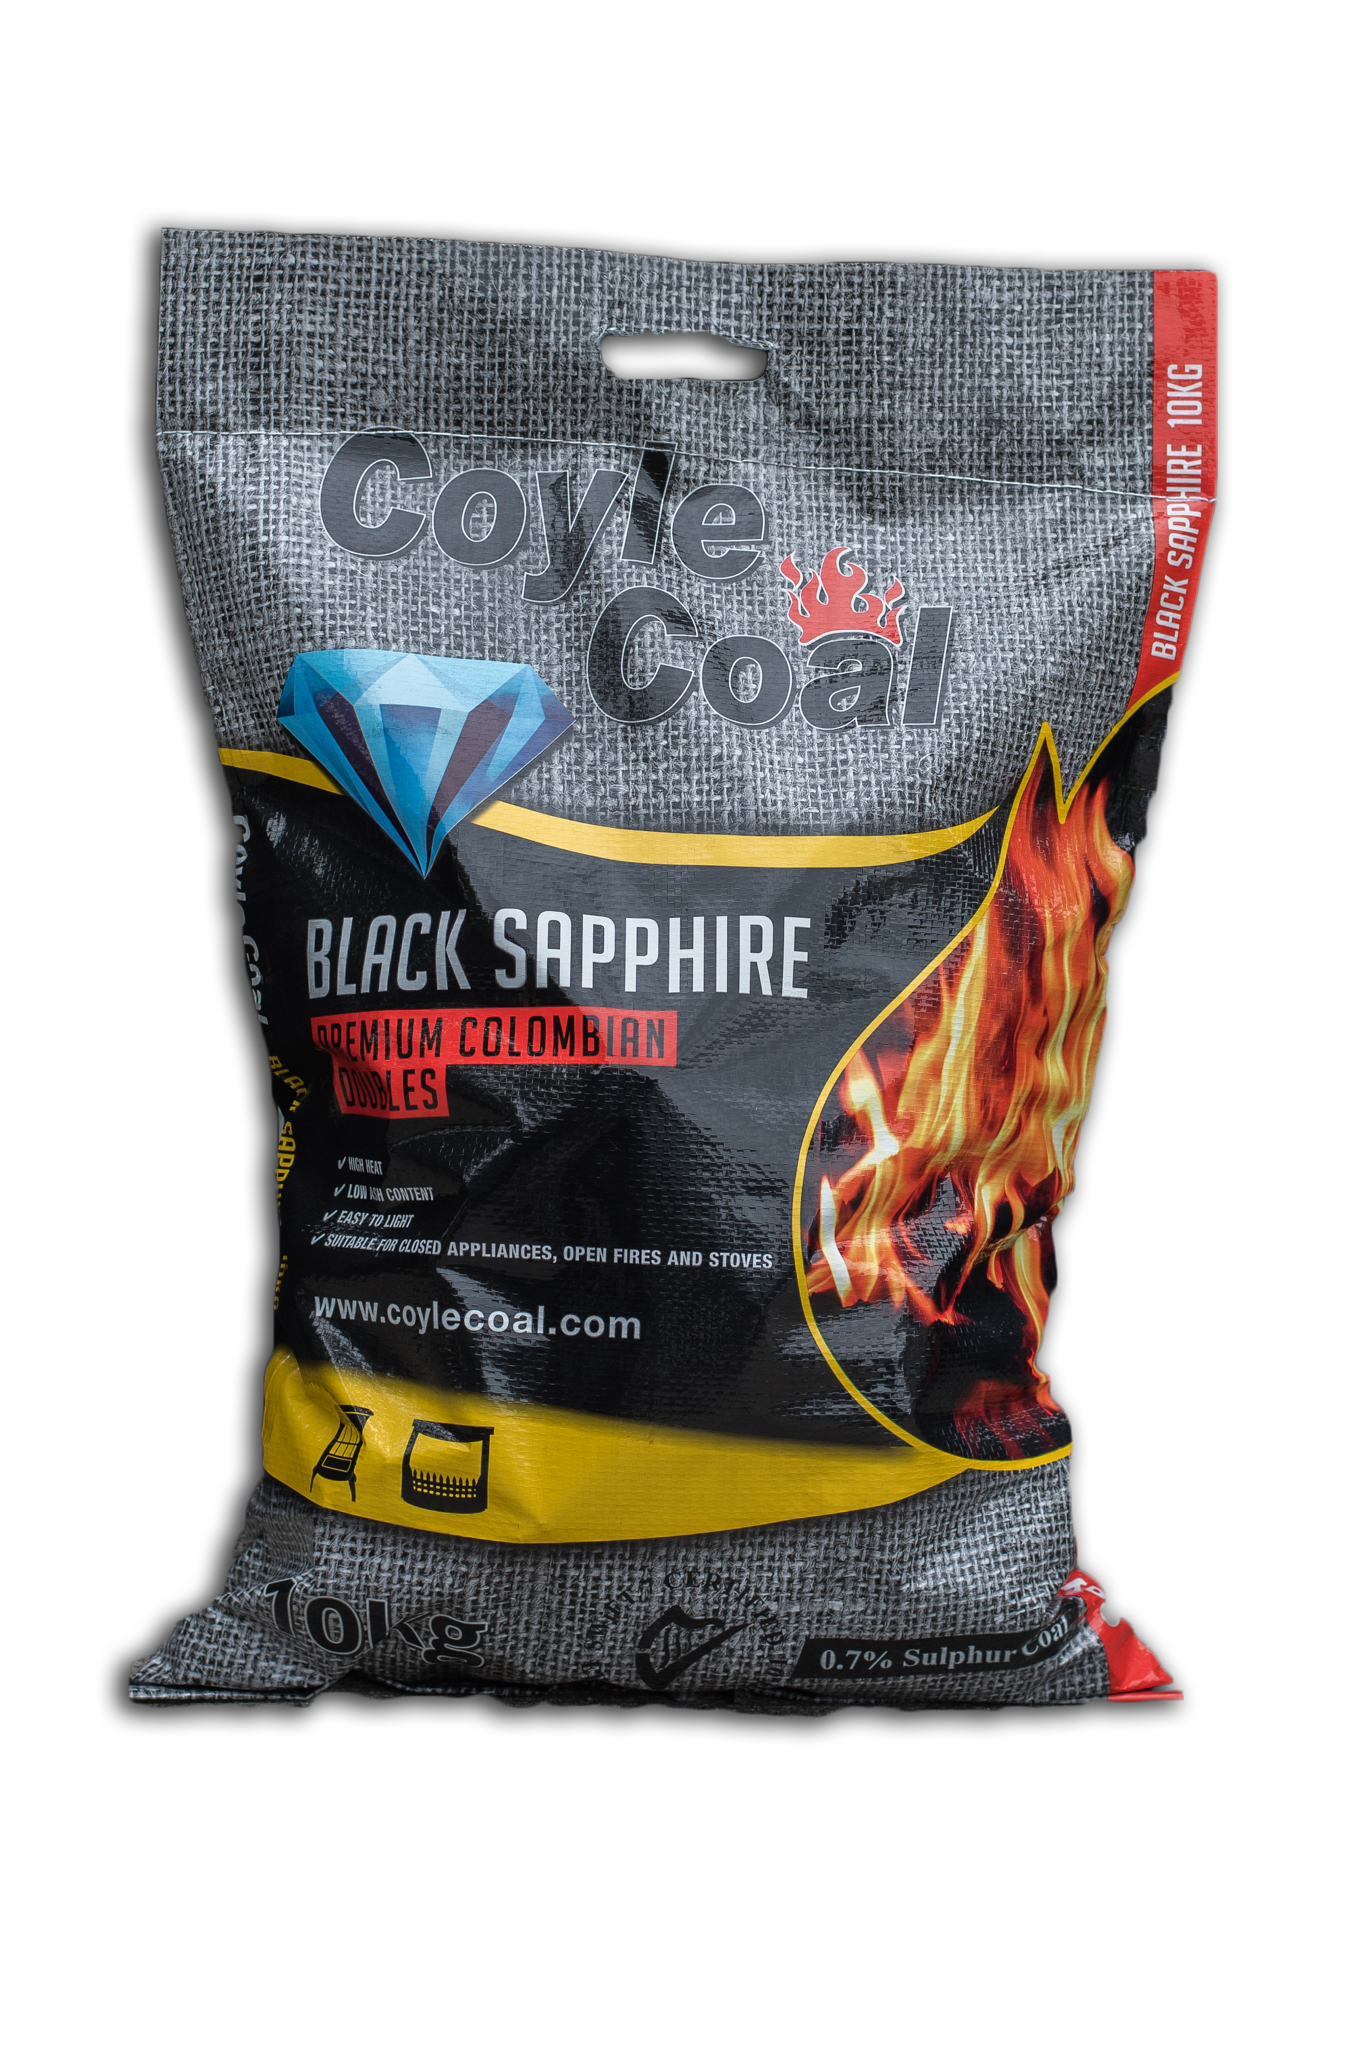 COYLECOAL- (7 of 18) BLACK SAPPHIRE 10KG